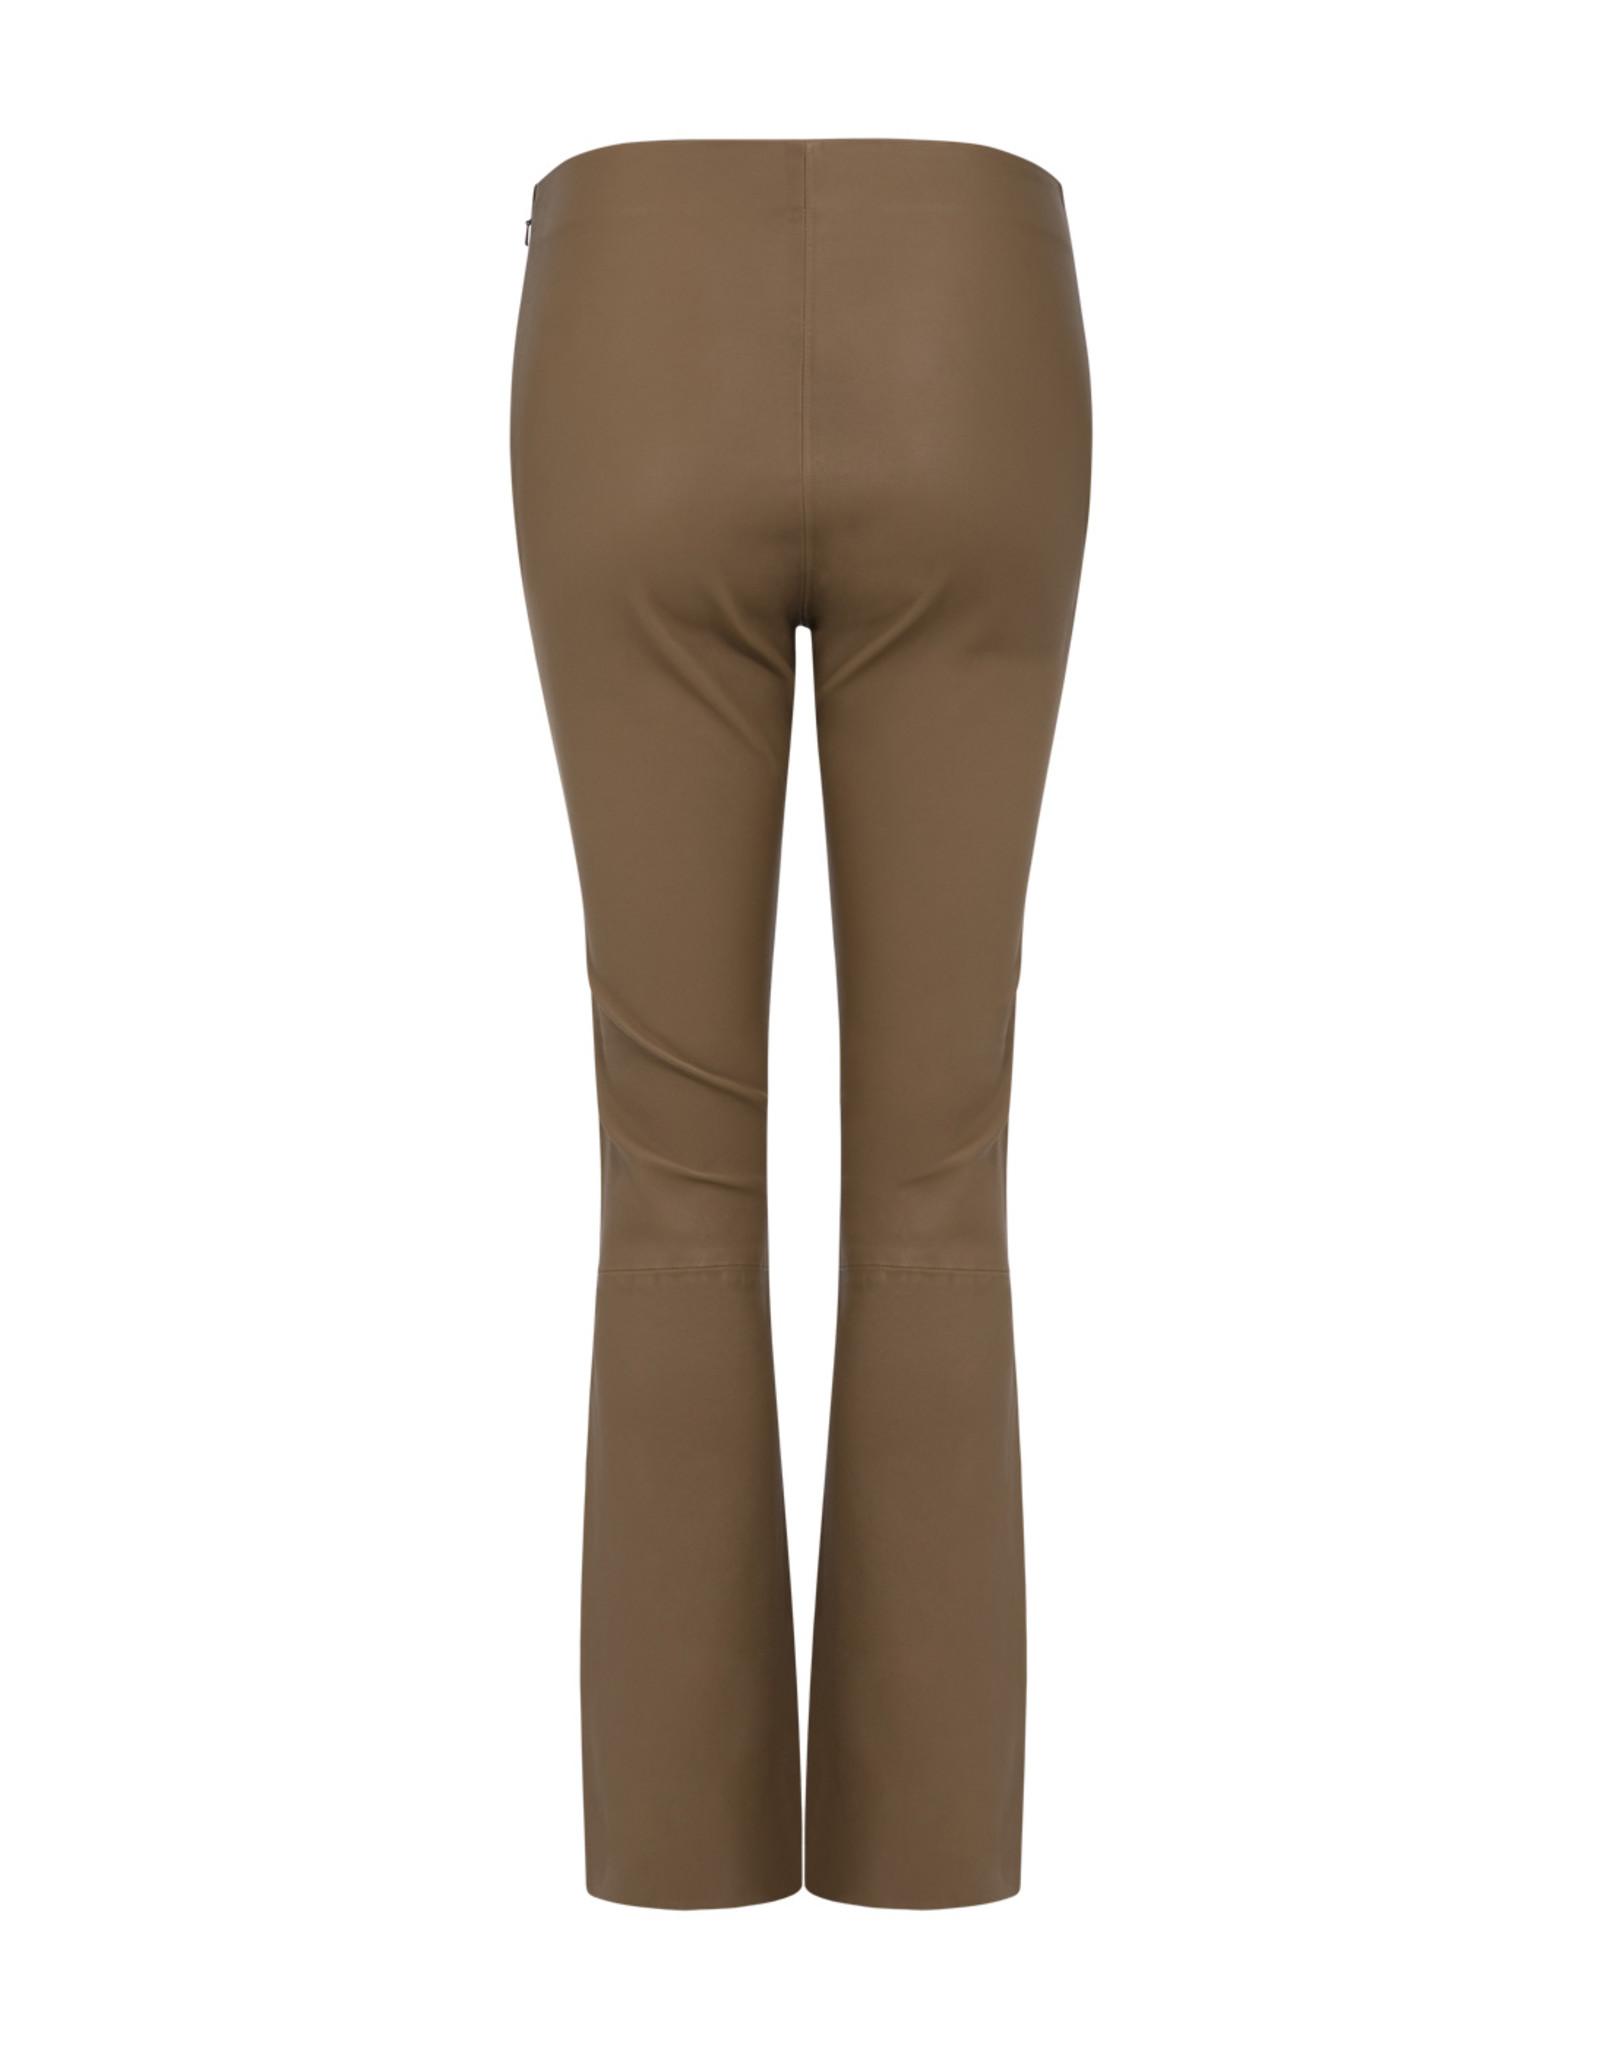 3202-397 Pantalon de cuir